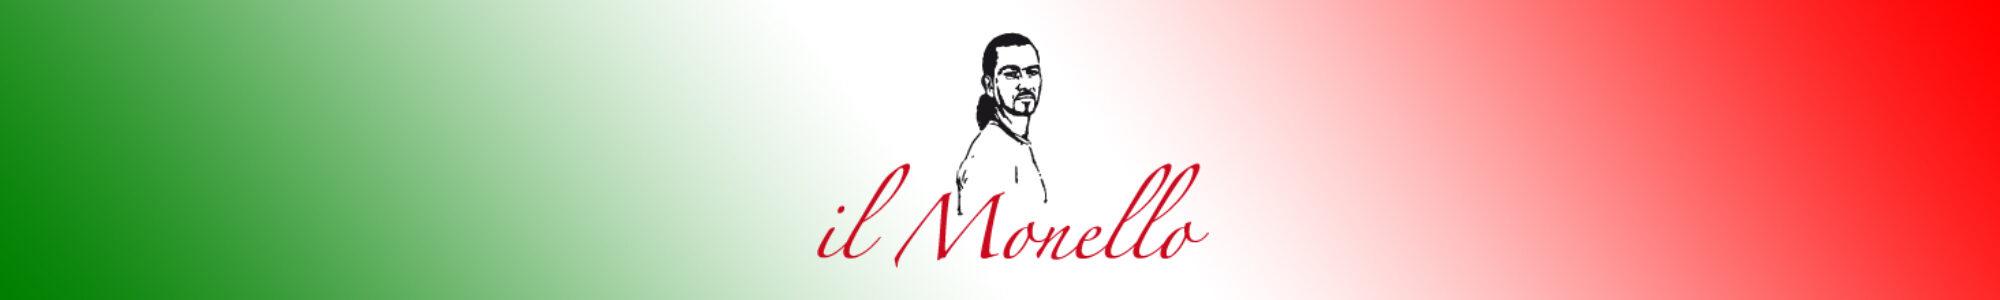 ilMonello